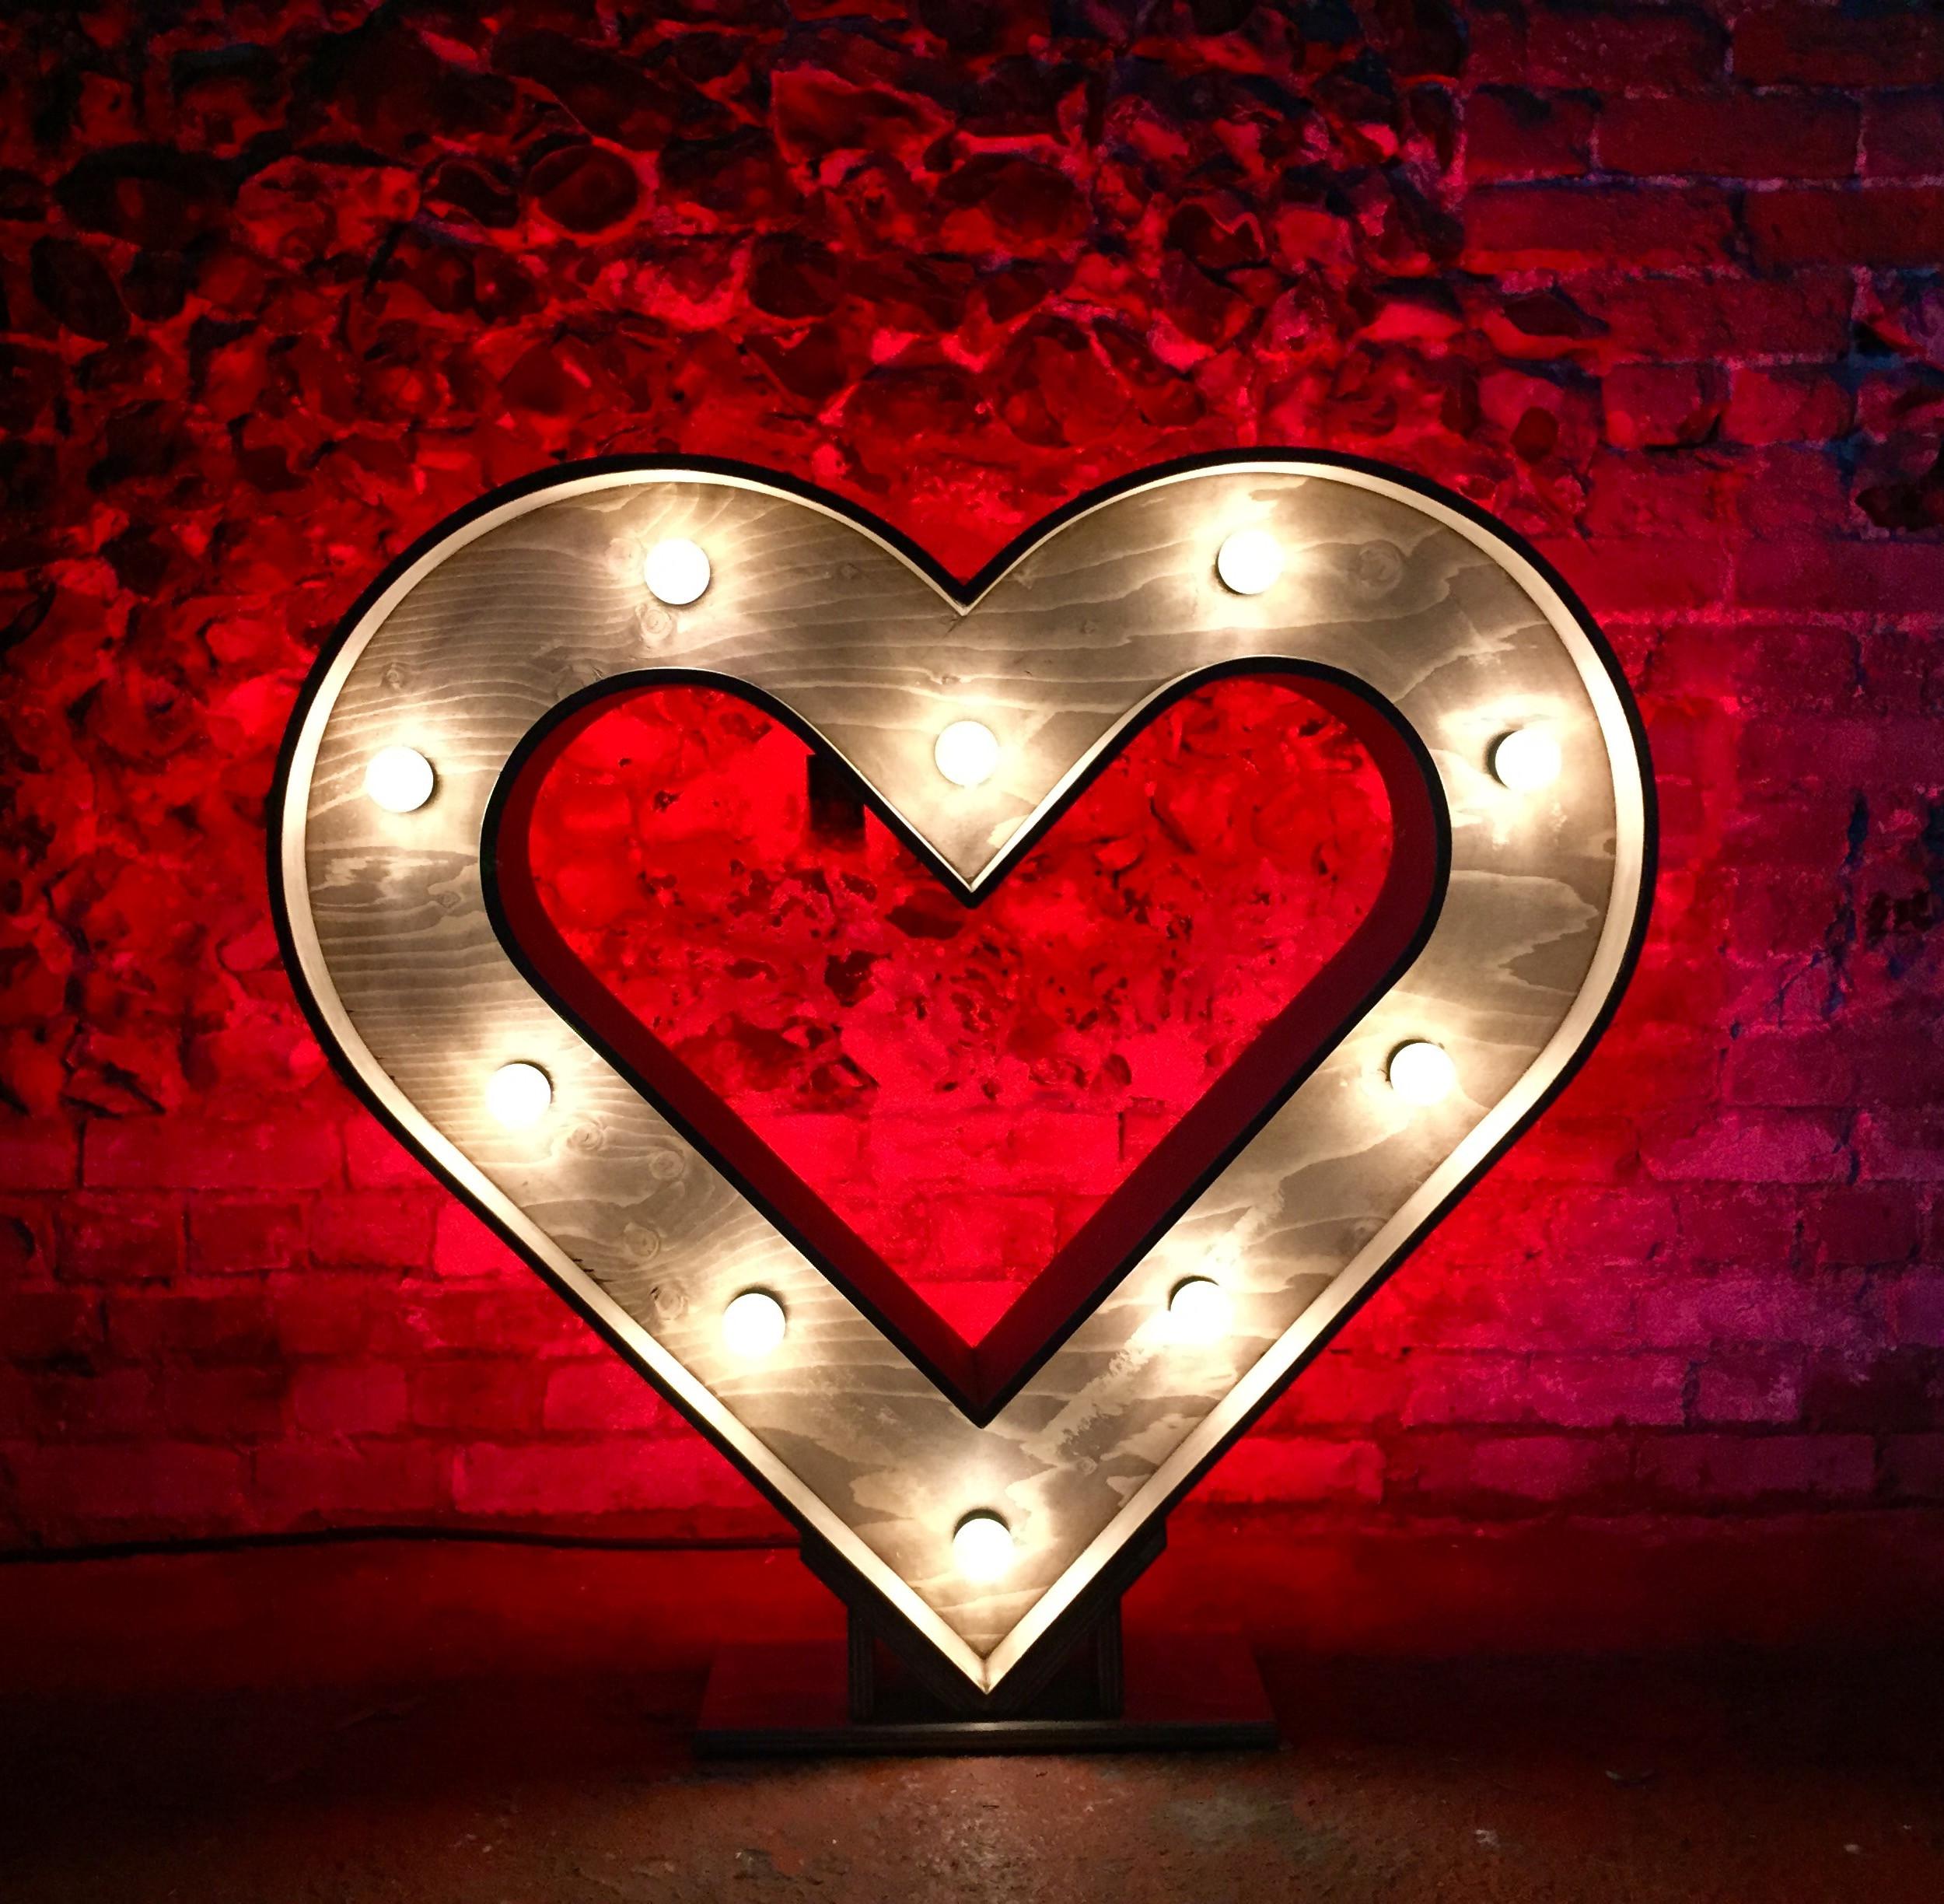 Rustic Illuminated Heart